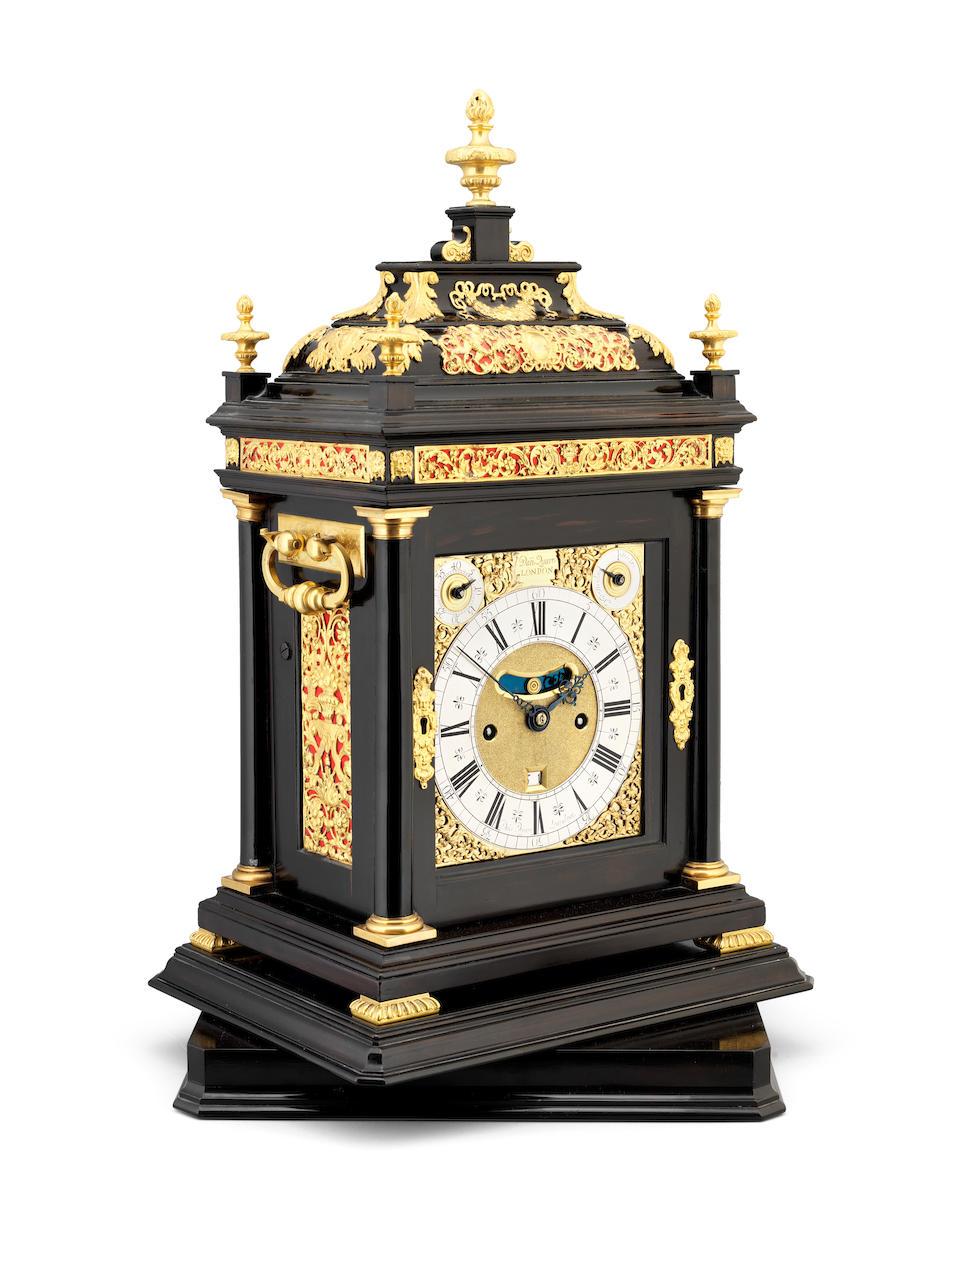 AN IMPRESSIVE EBONY TURNTABLE CLOCK WITH KEYHOLE BACKPLATE Daniel Quare, London, circa 1706